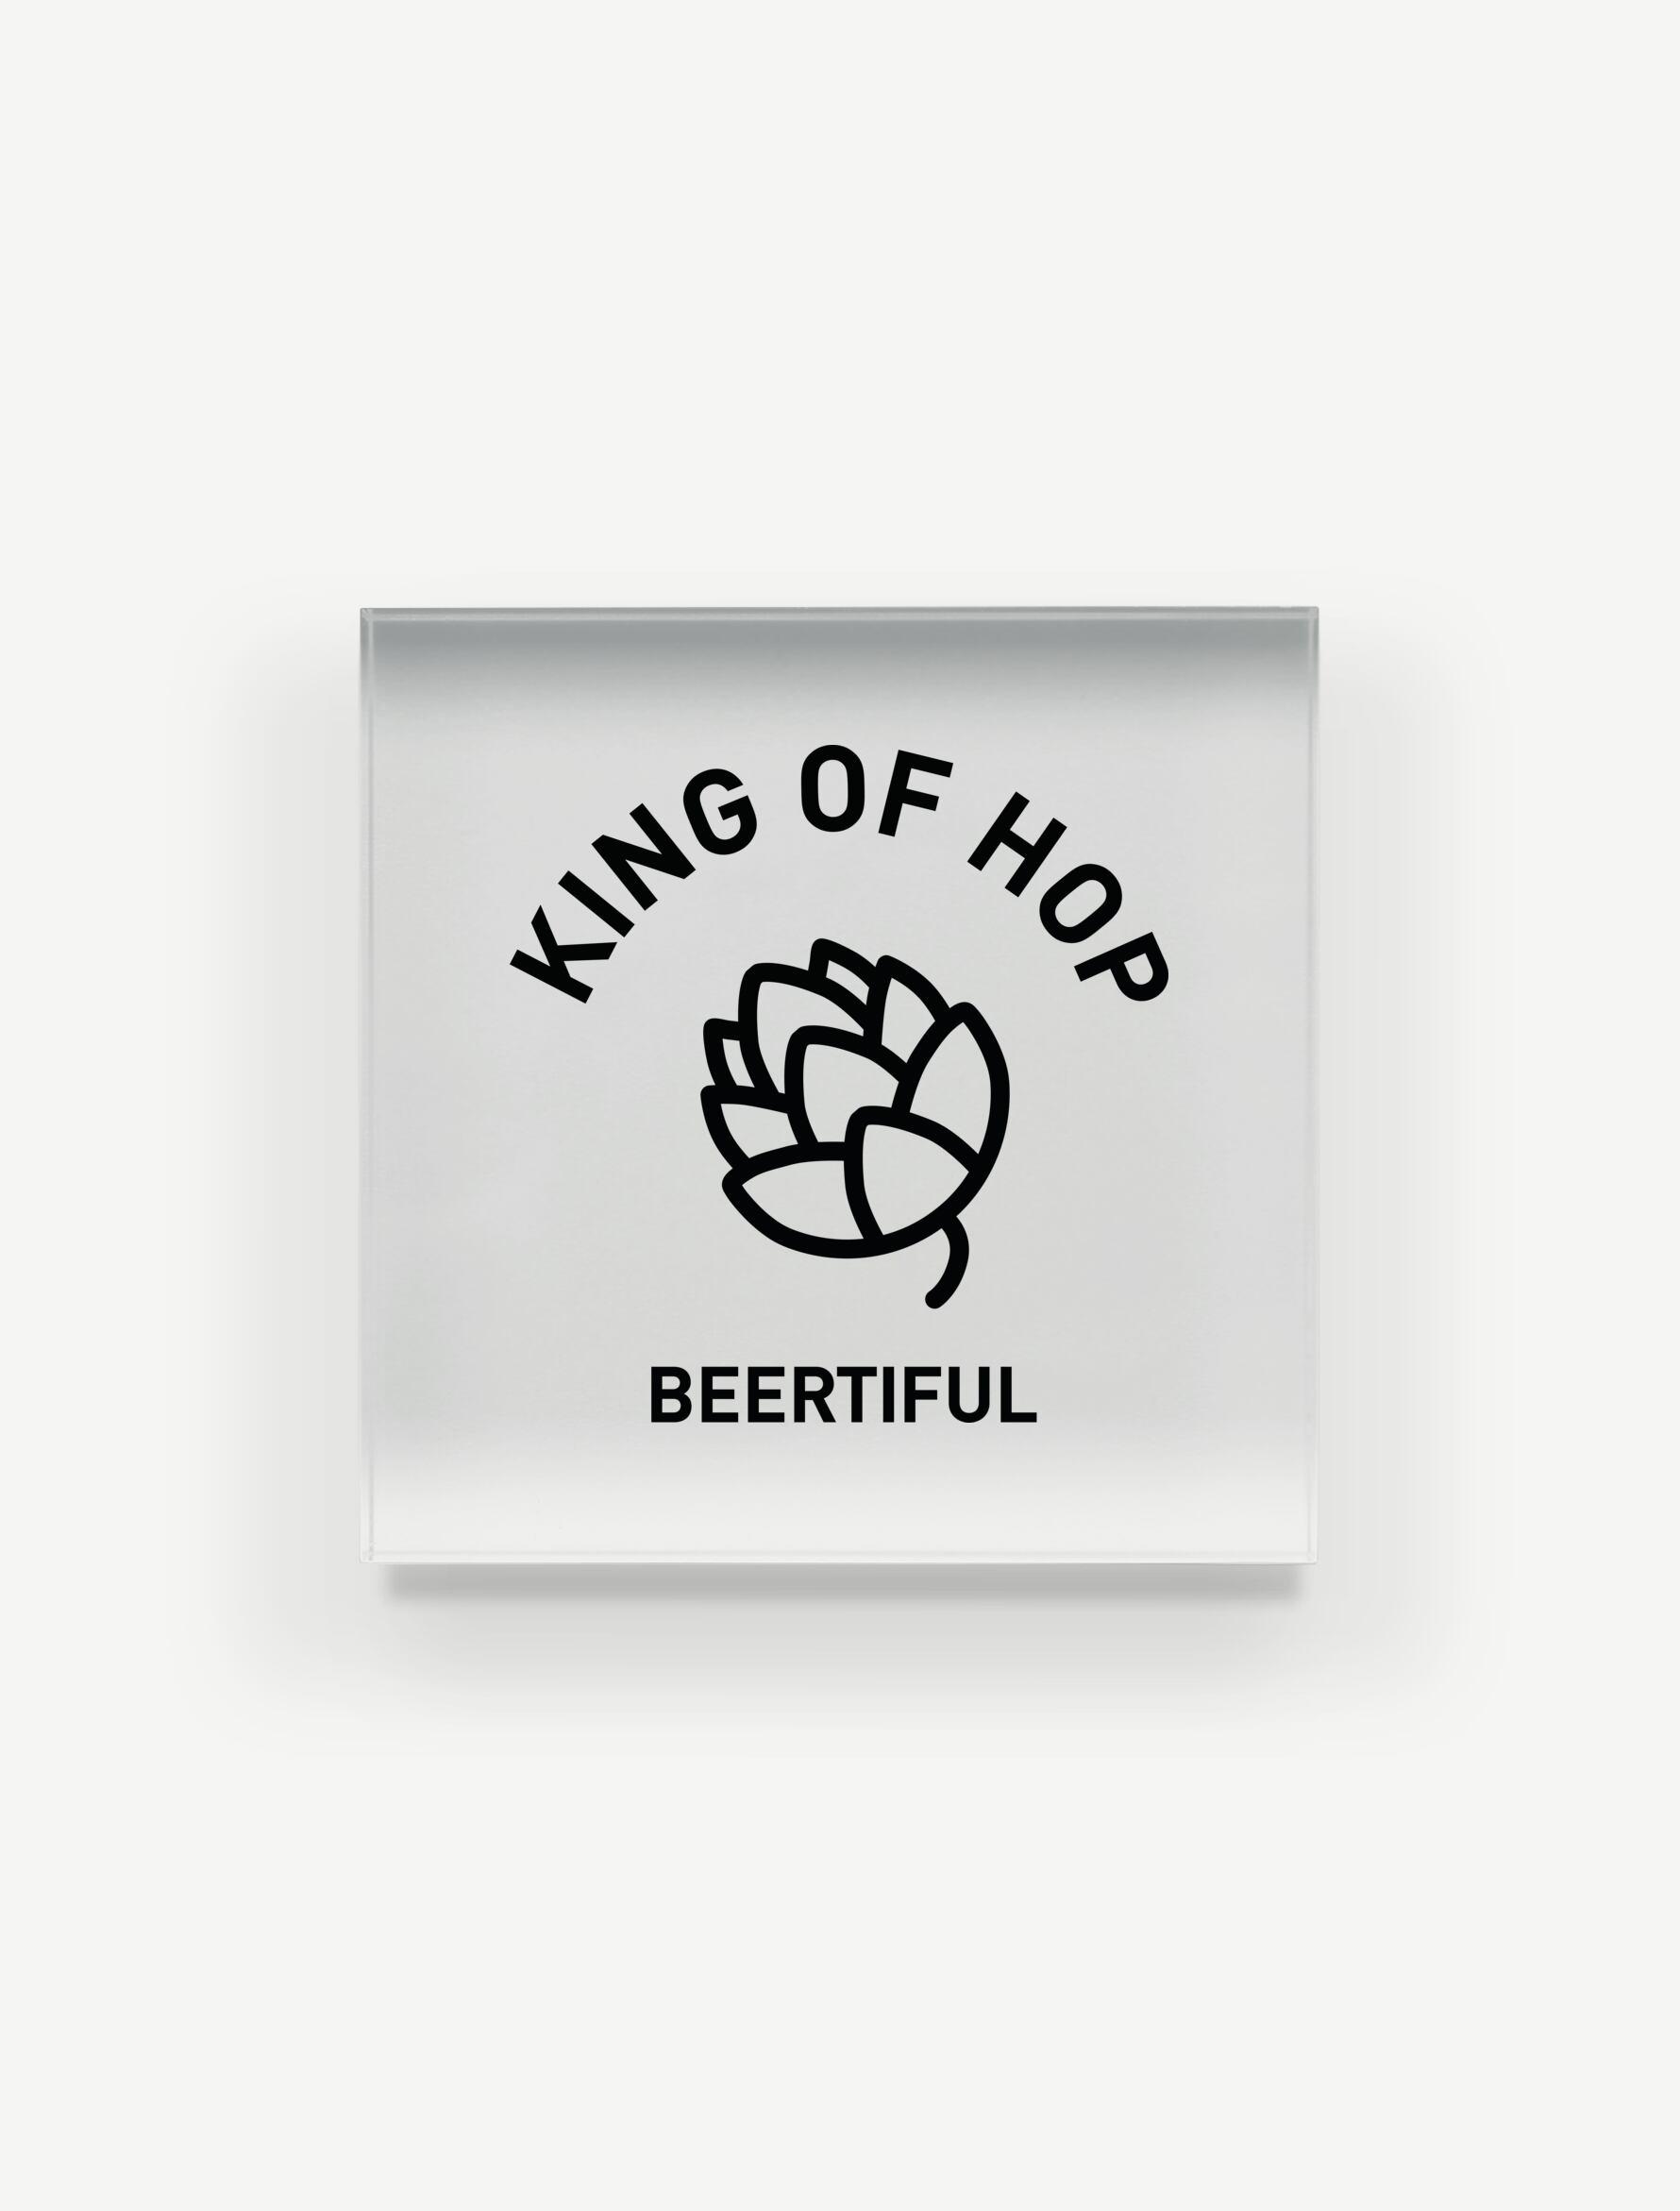 【KING OF HOP】アクリルブロック